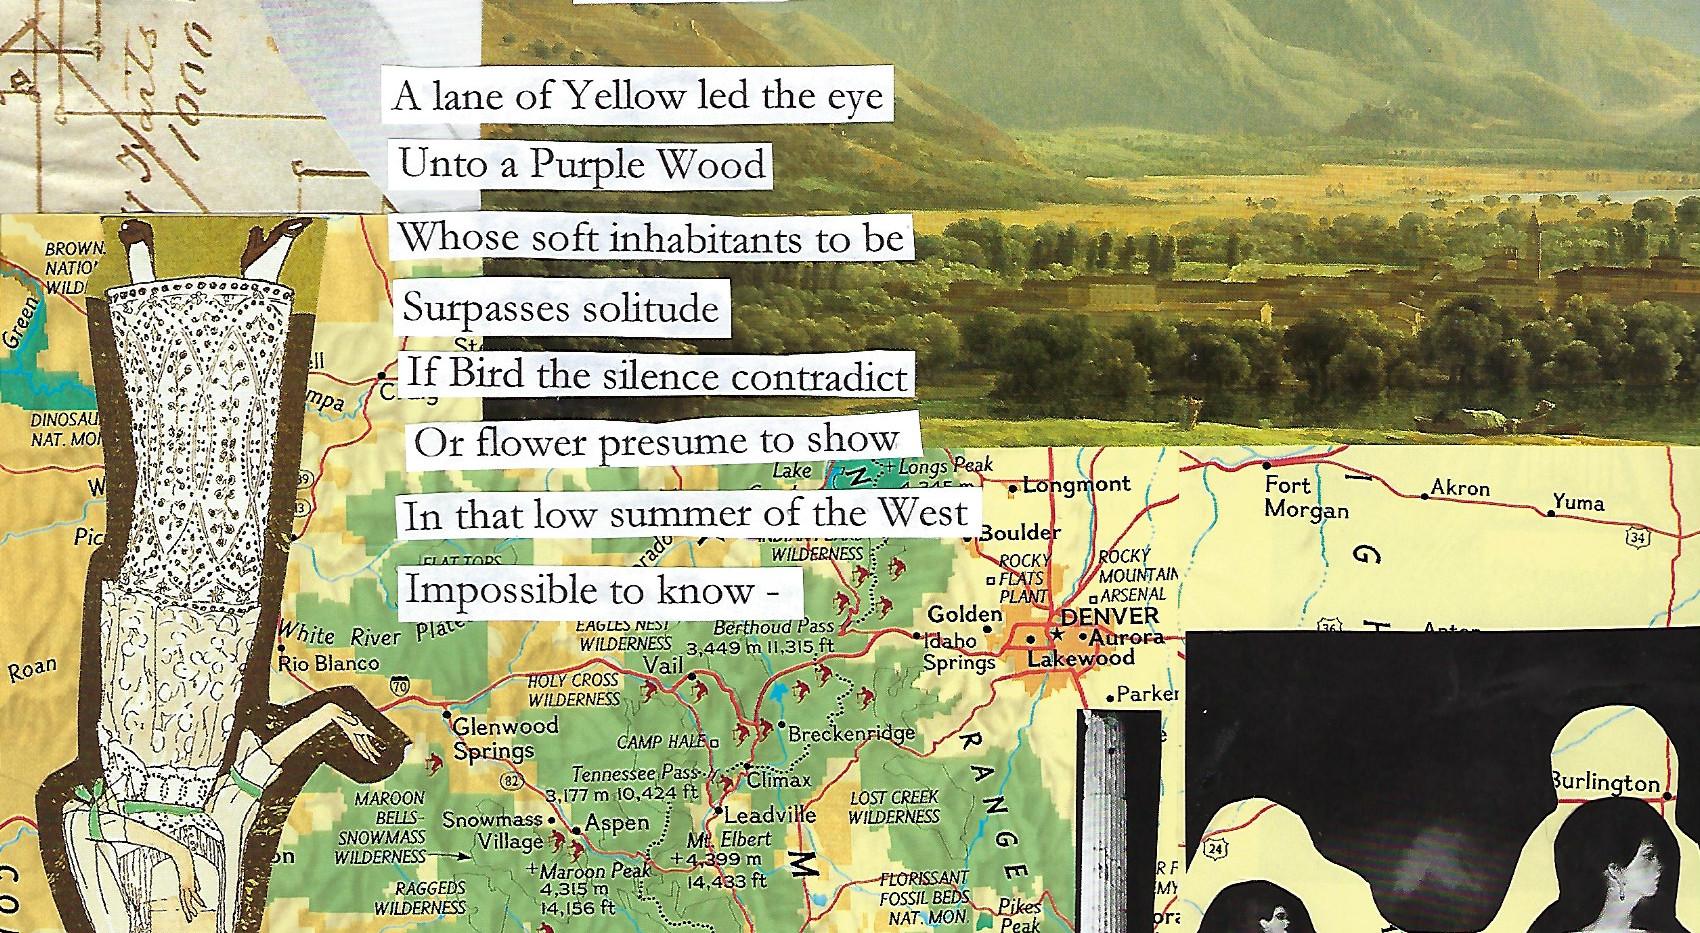 A Lane of Yellow Led the Eye